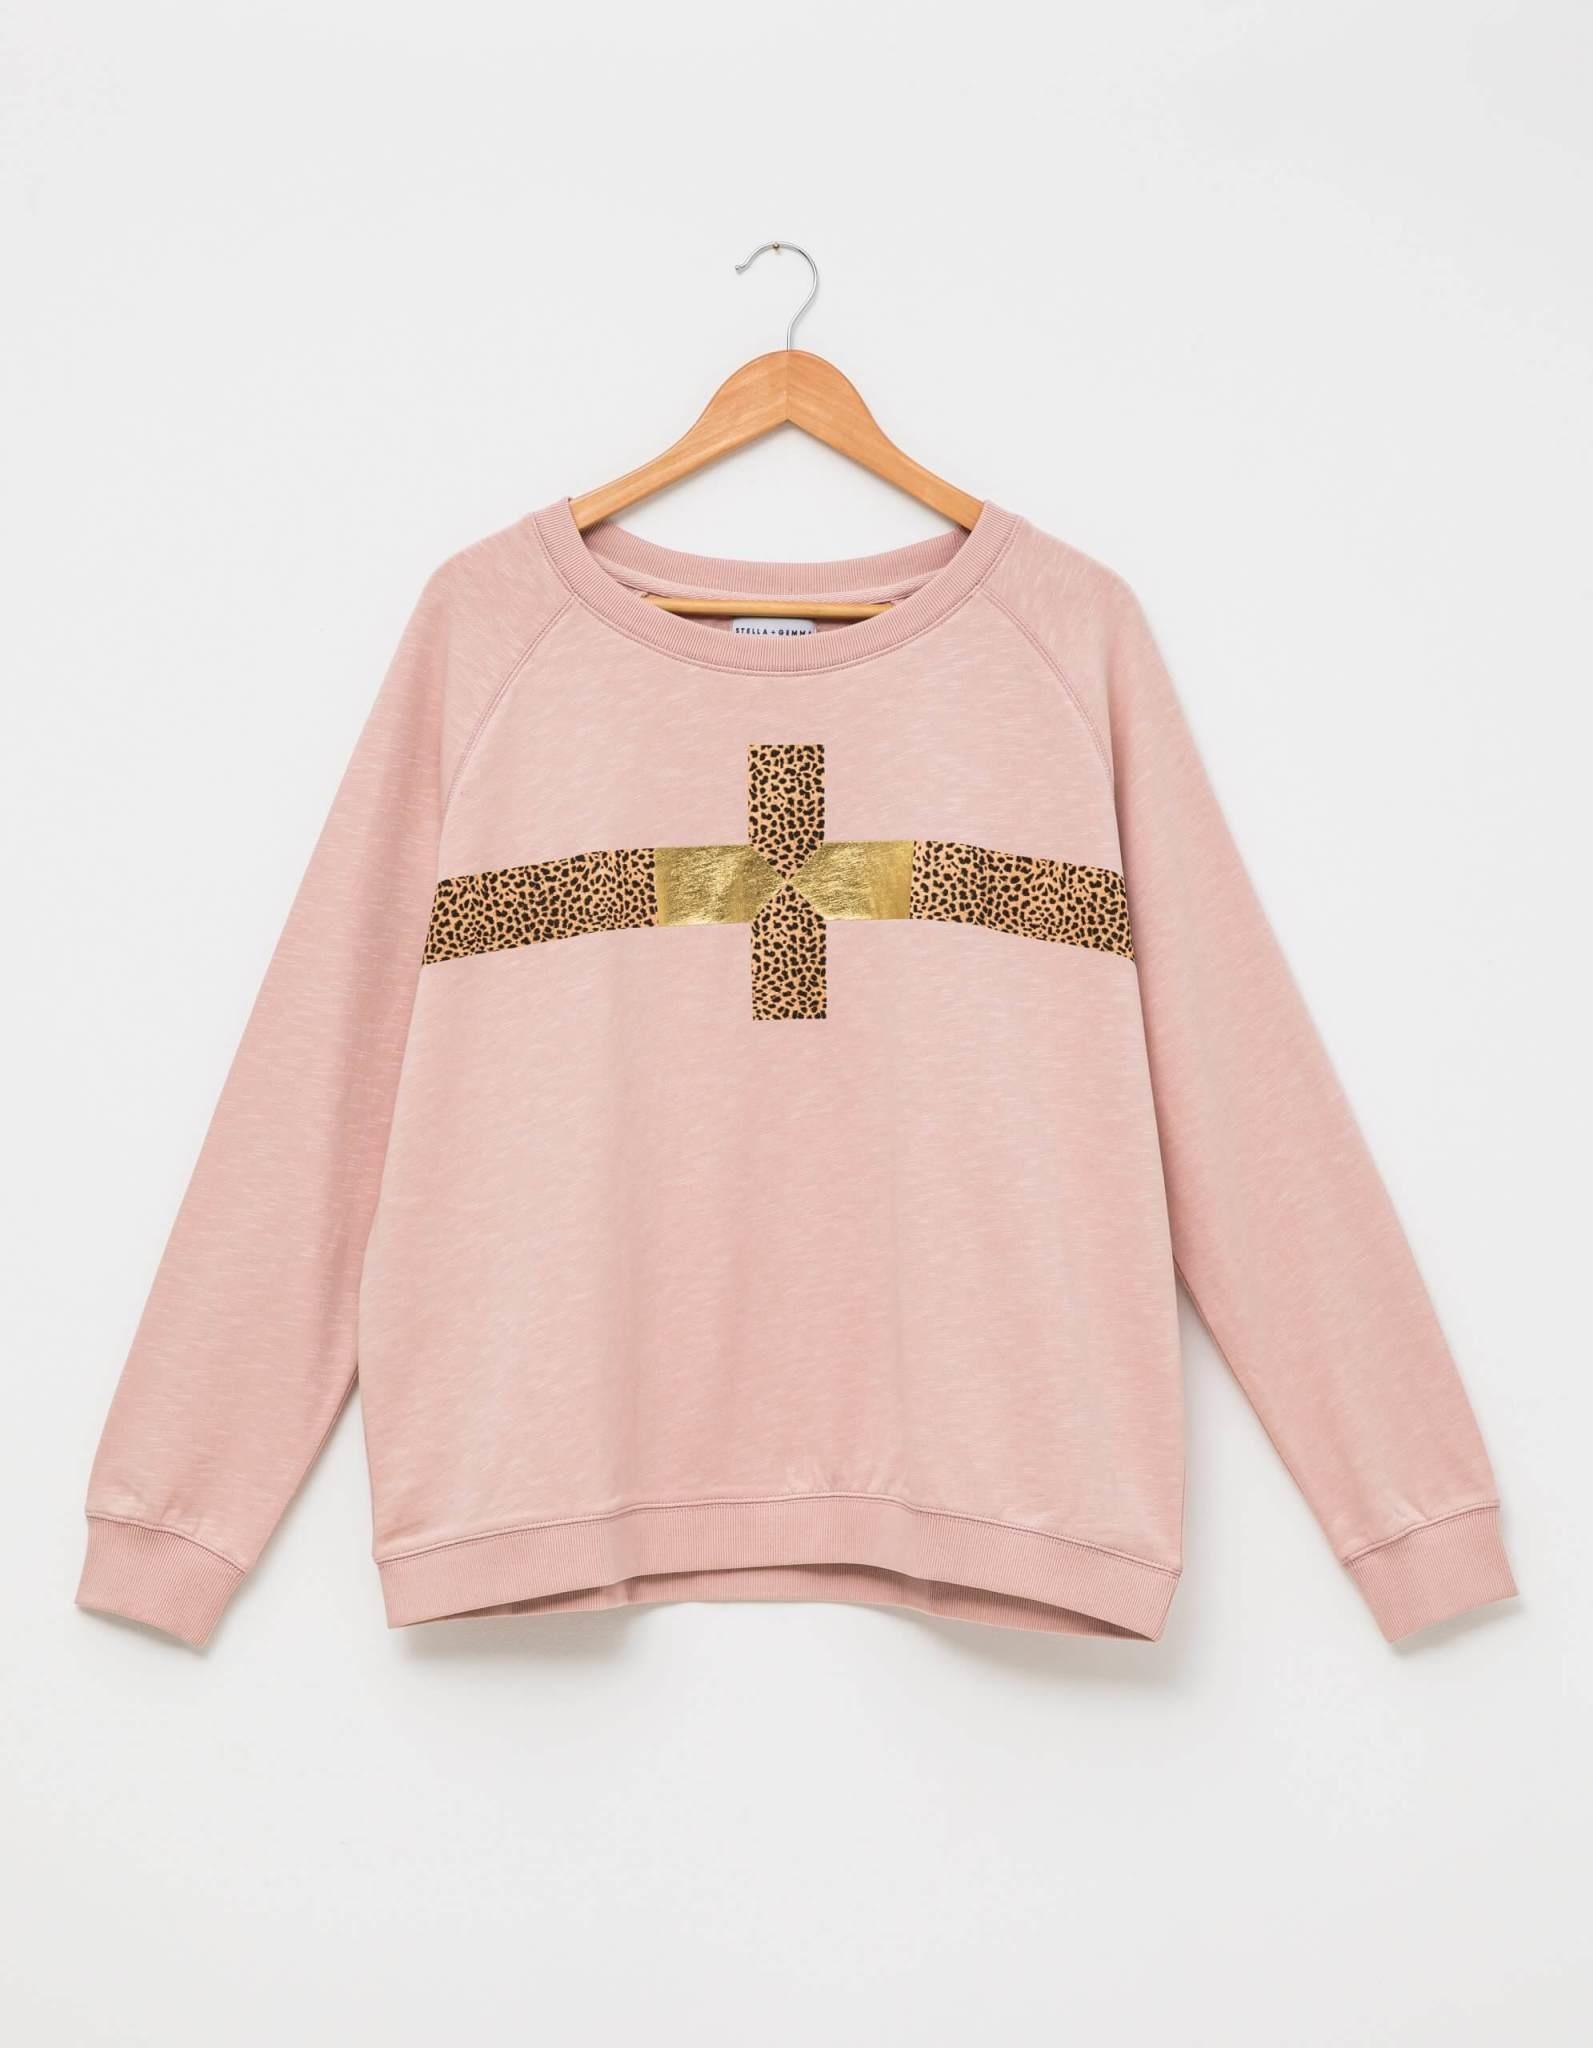 Stella & Gemma Rose Cheetah Sweater